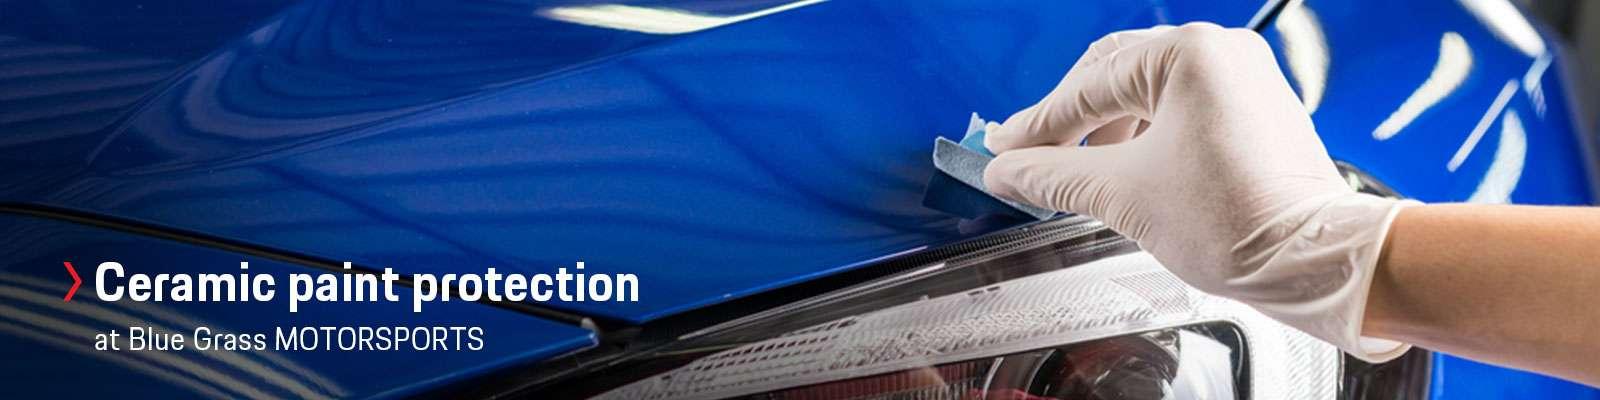 Gliptone GT Quartz Ceramic Coating Paint Protection at Blue Grass MOTORSPORT